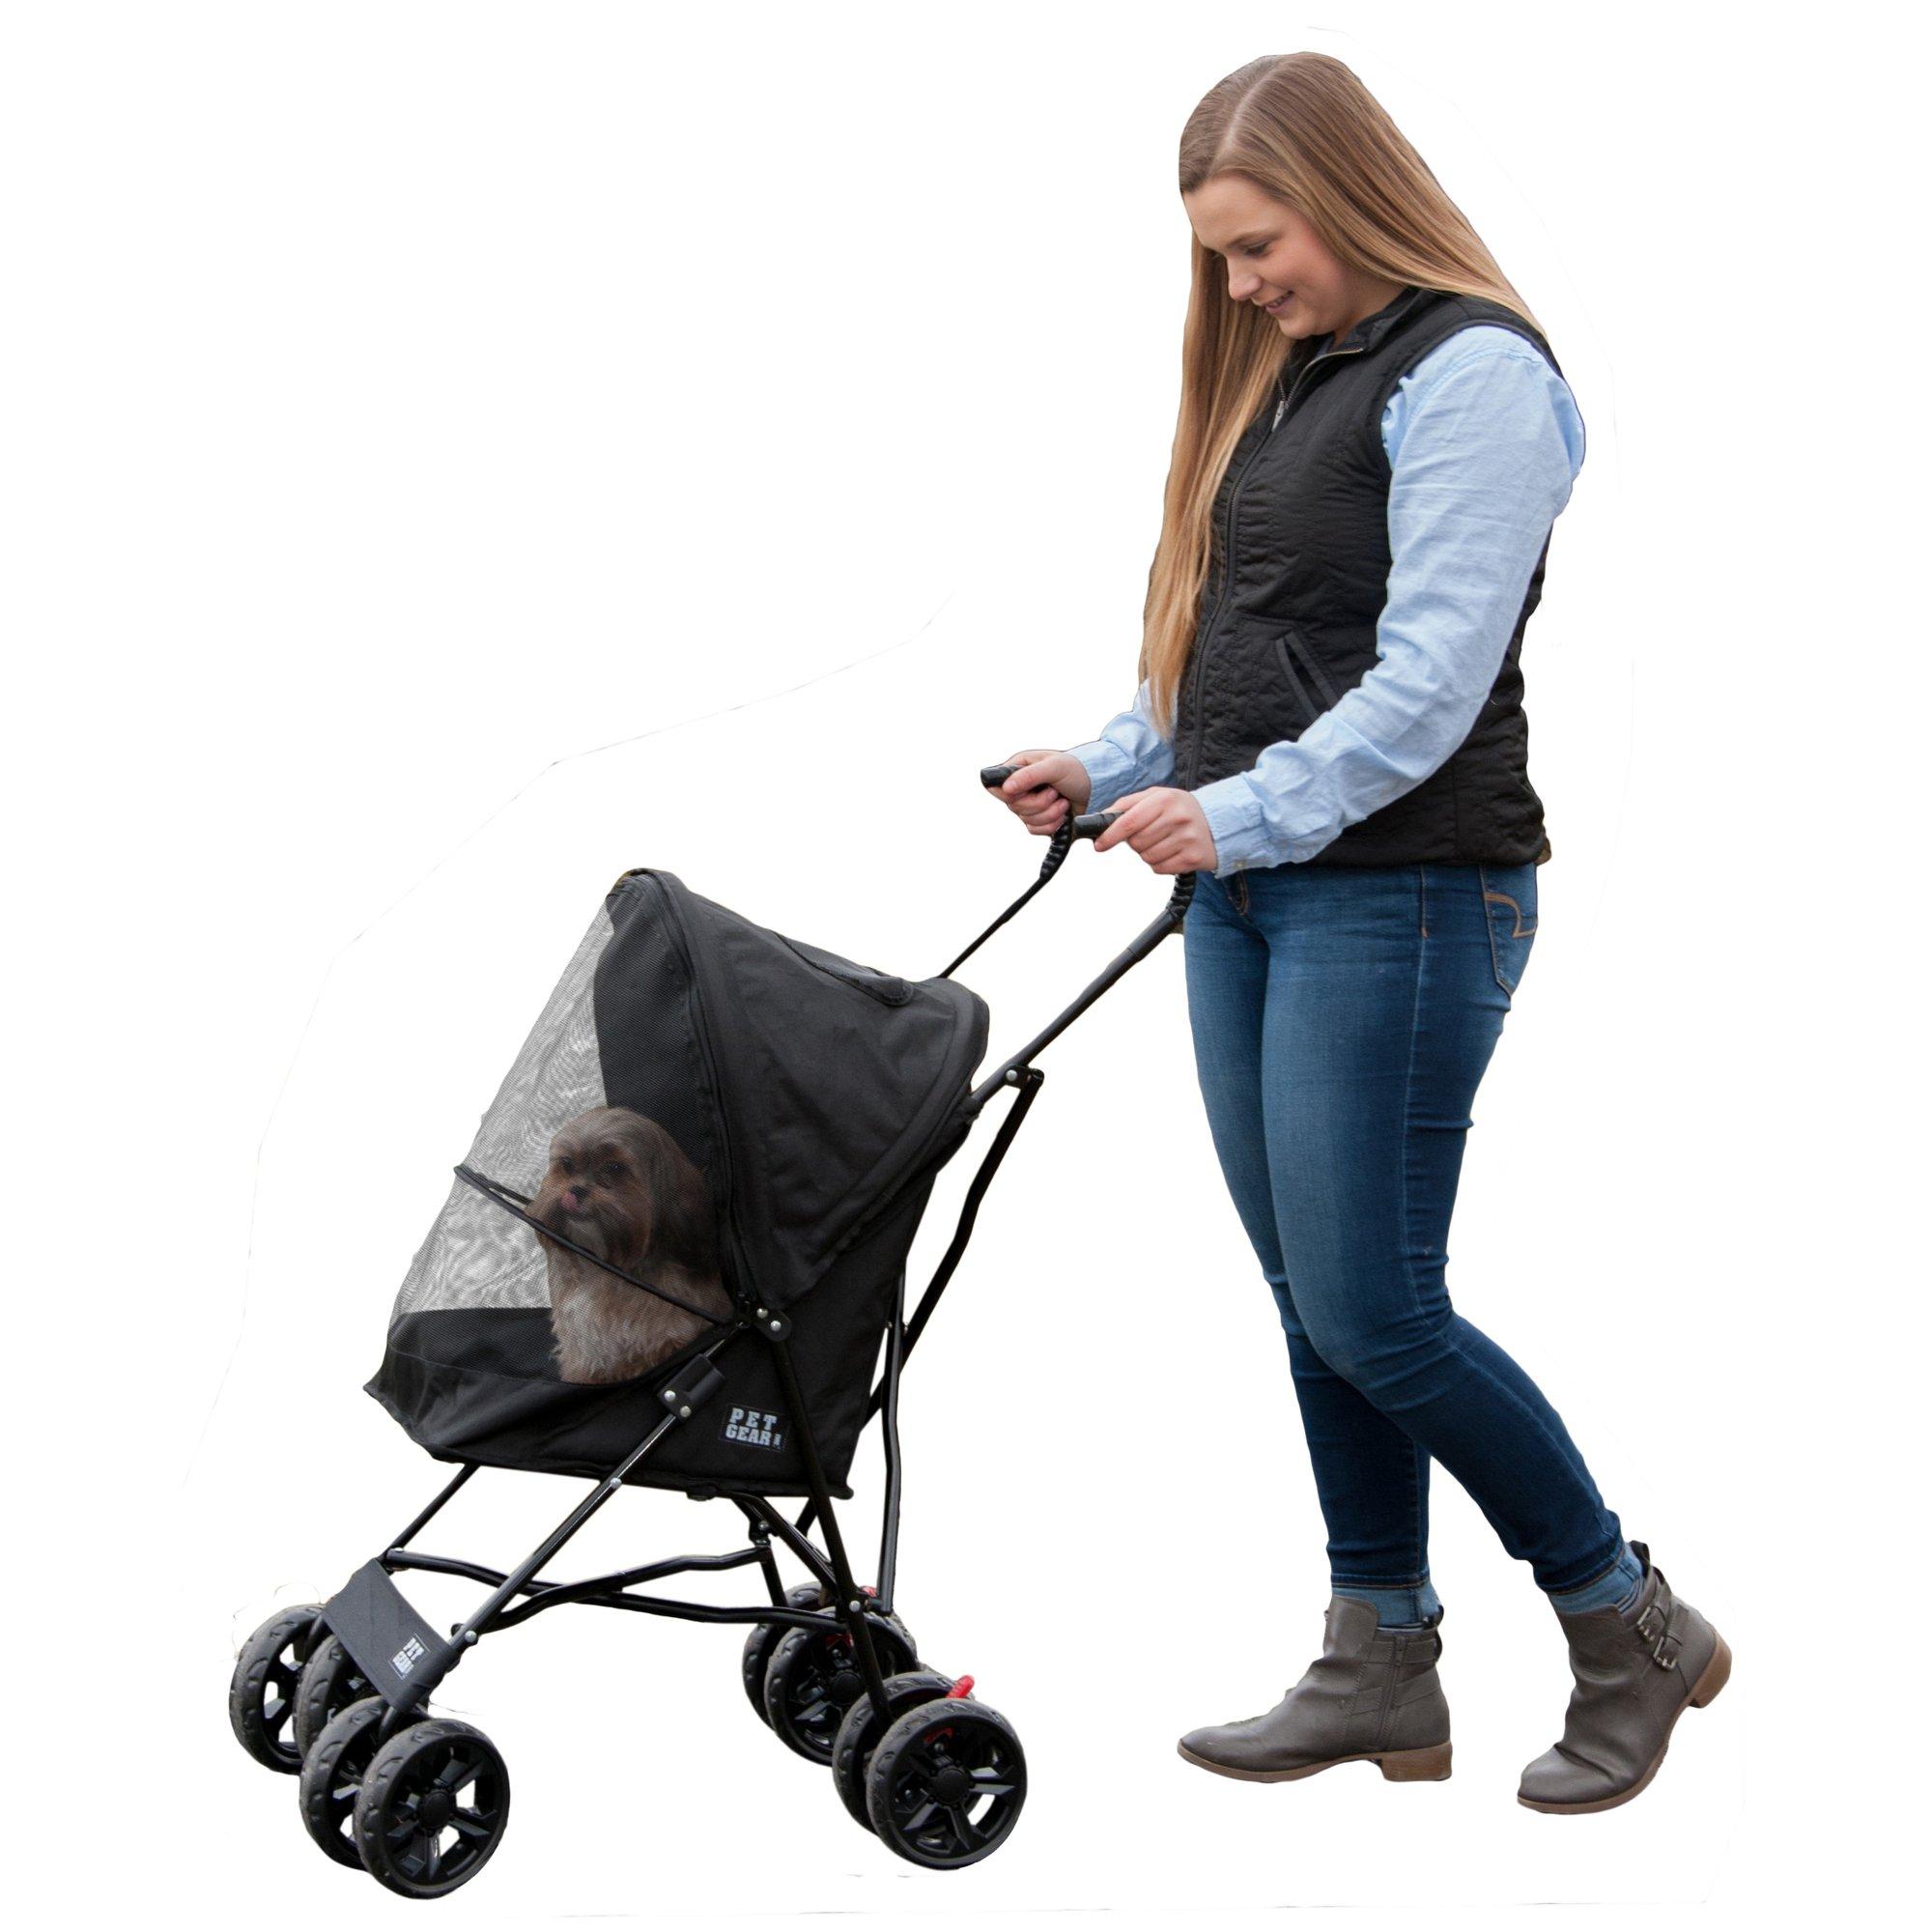 Pet Gear Travel Lite Pet Stroller in Black | Petco